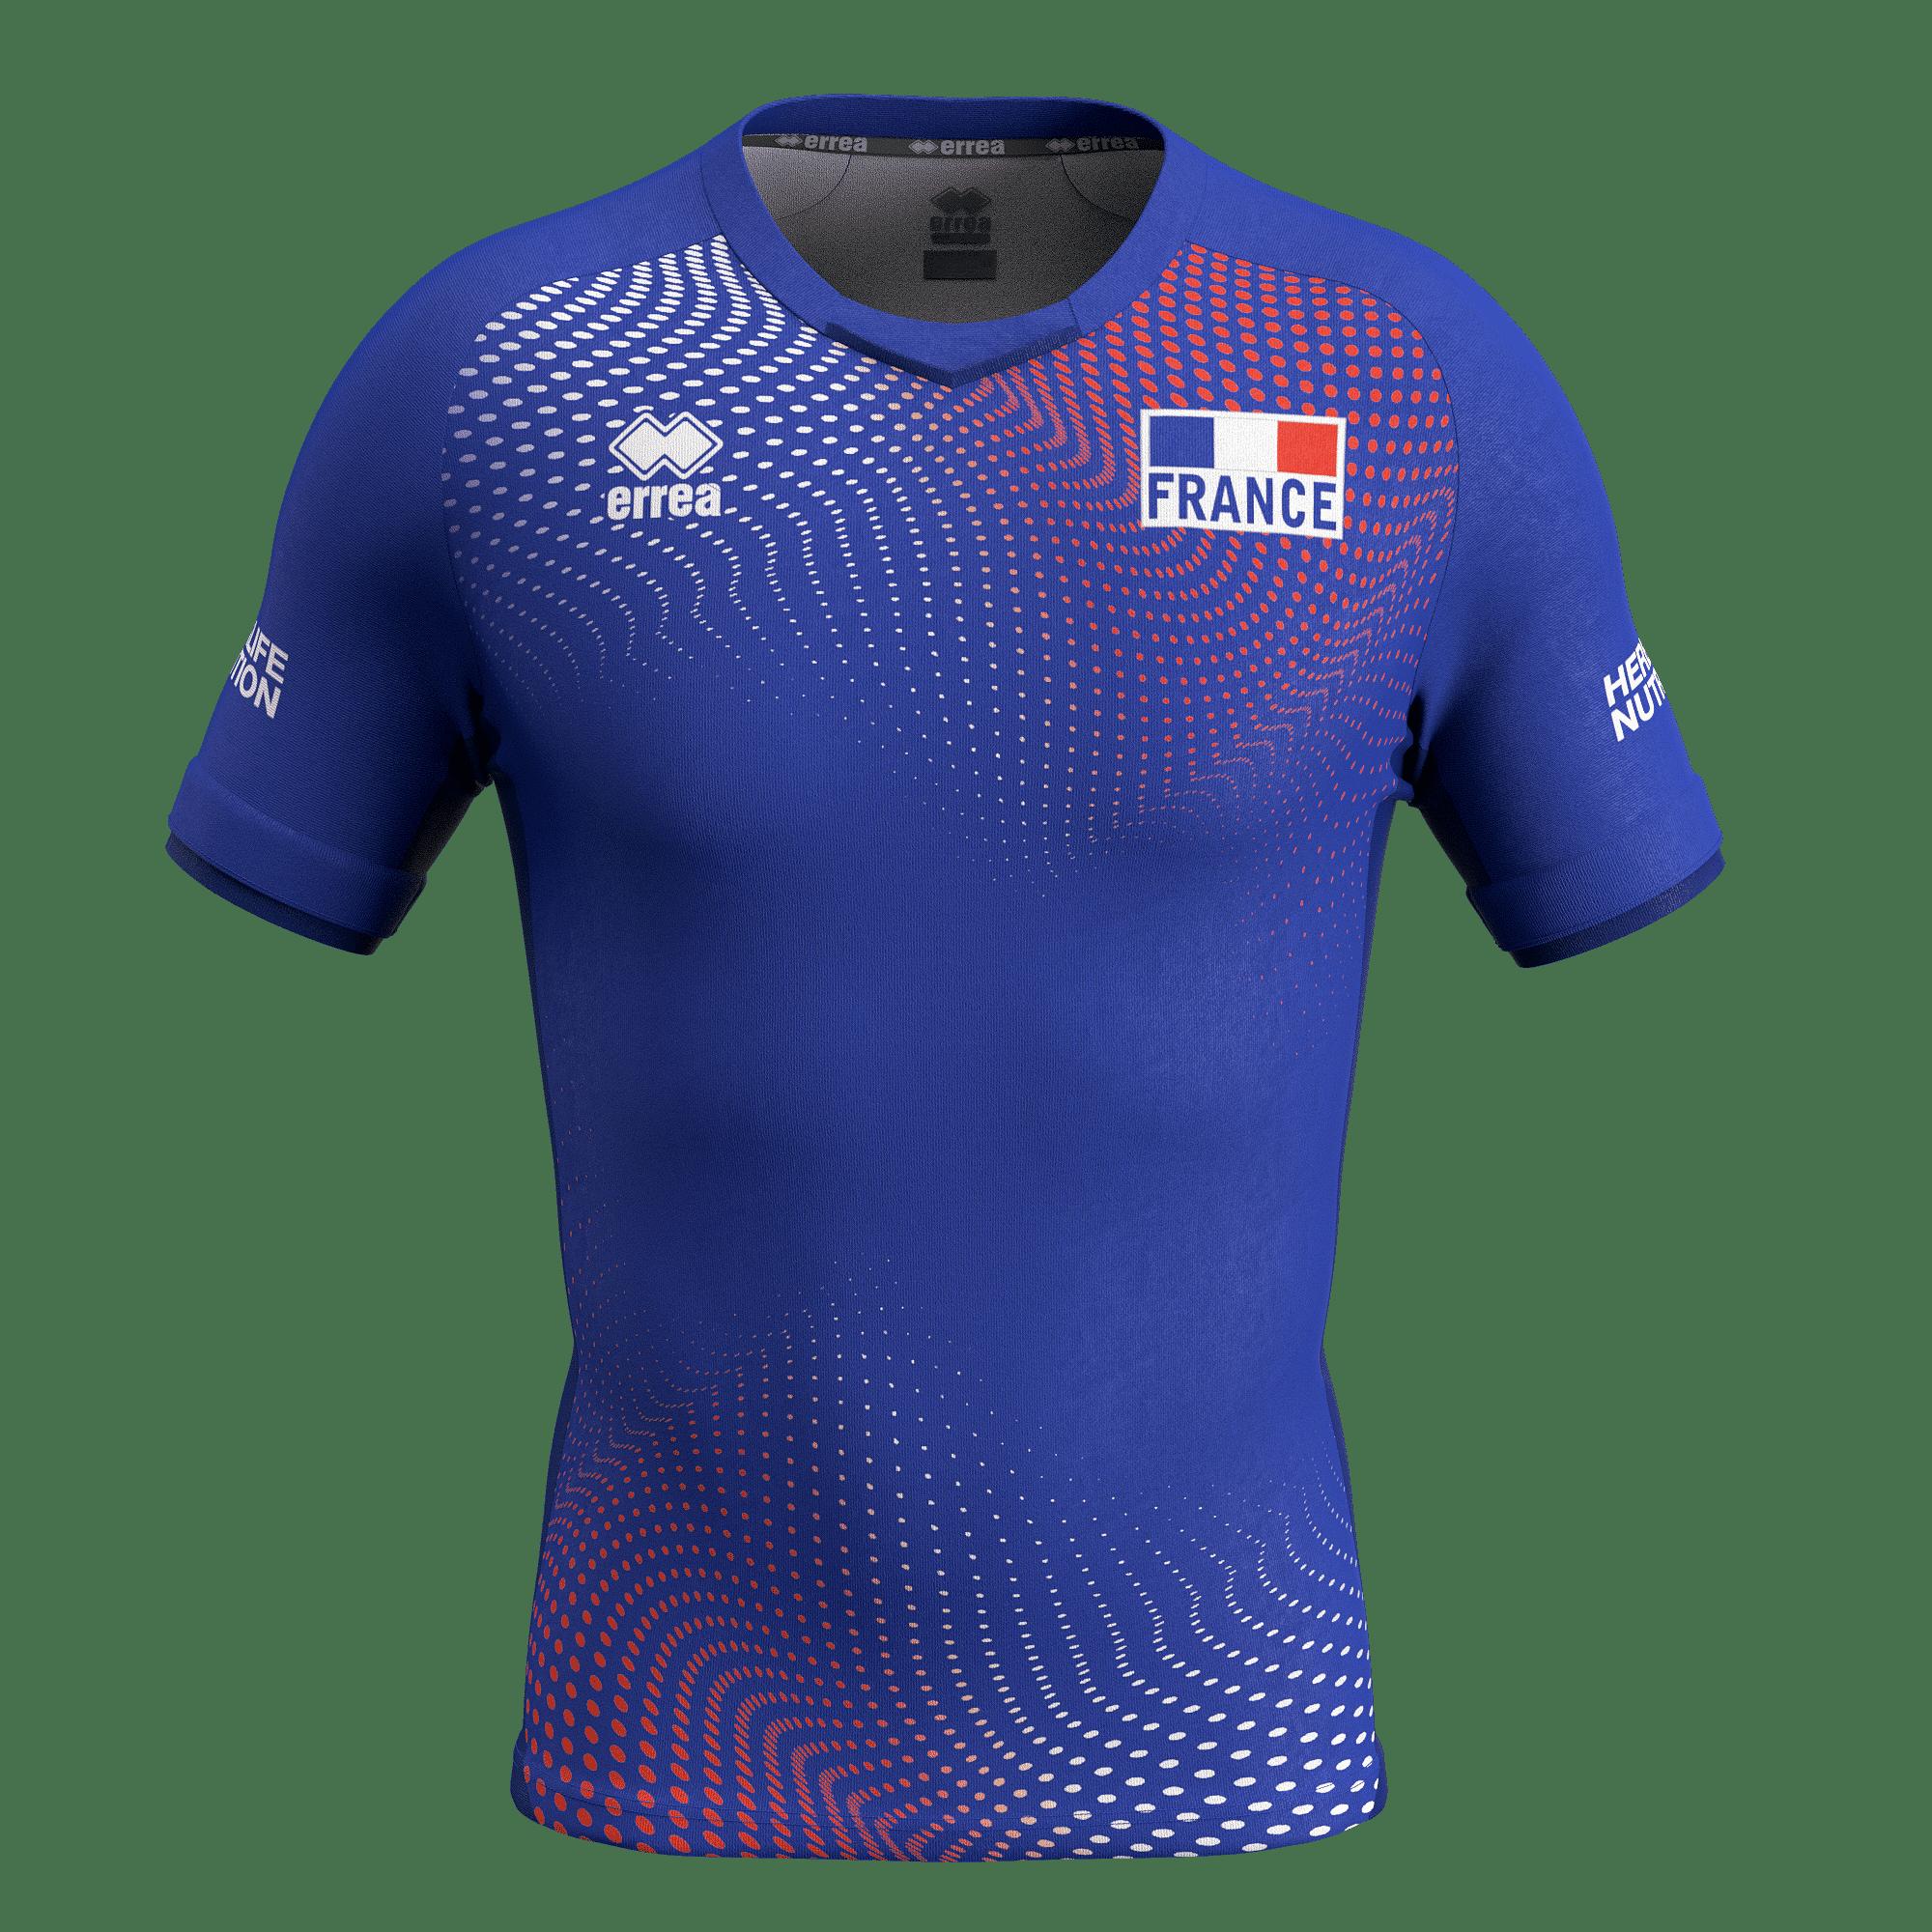 maillot-equipe-de-france-volleyball-euro-2019-errea-1